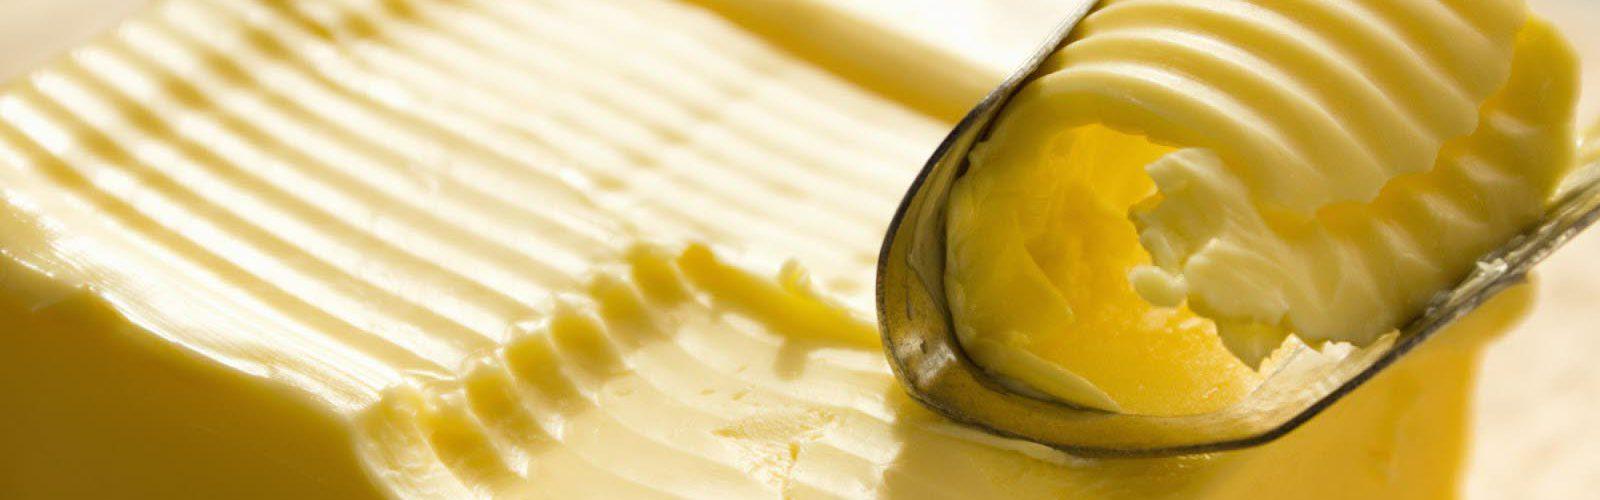 Cultura Gastronómica | ¿Mantequilla o margarina?